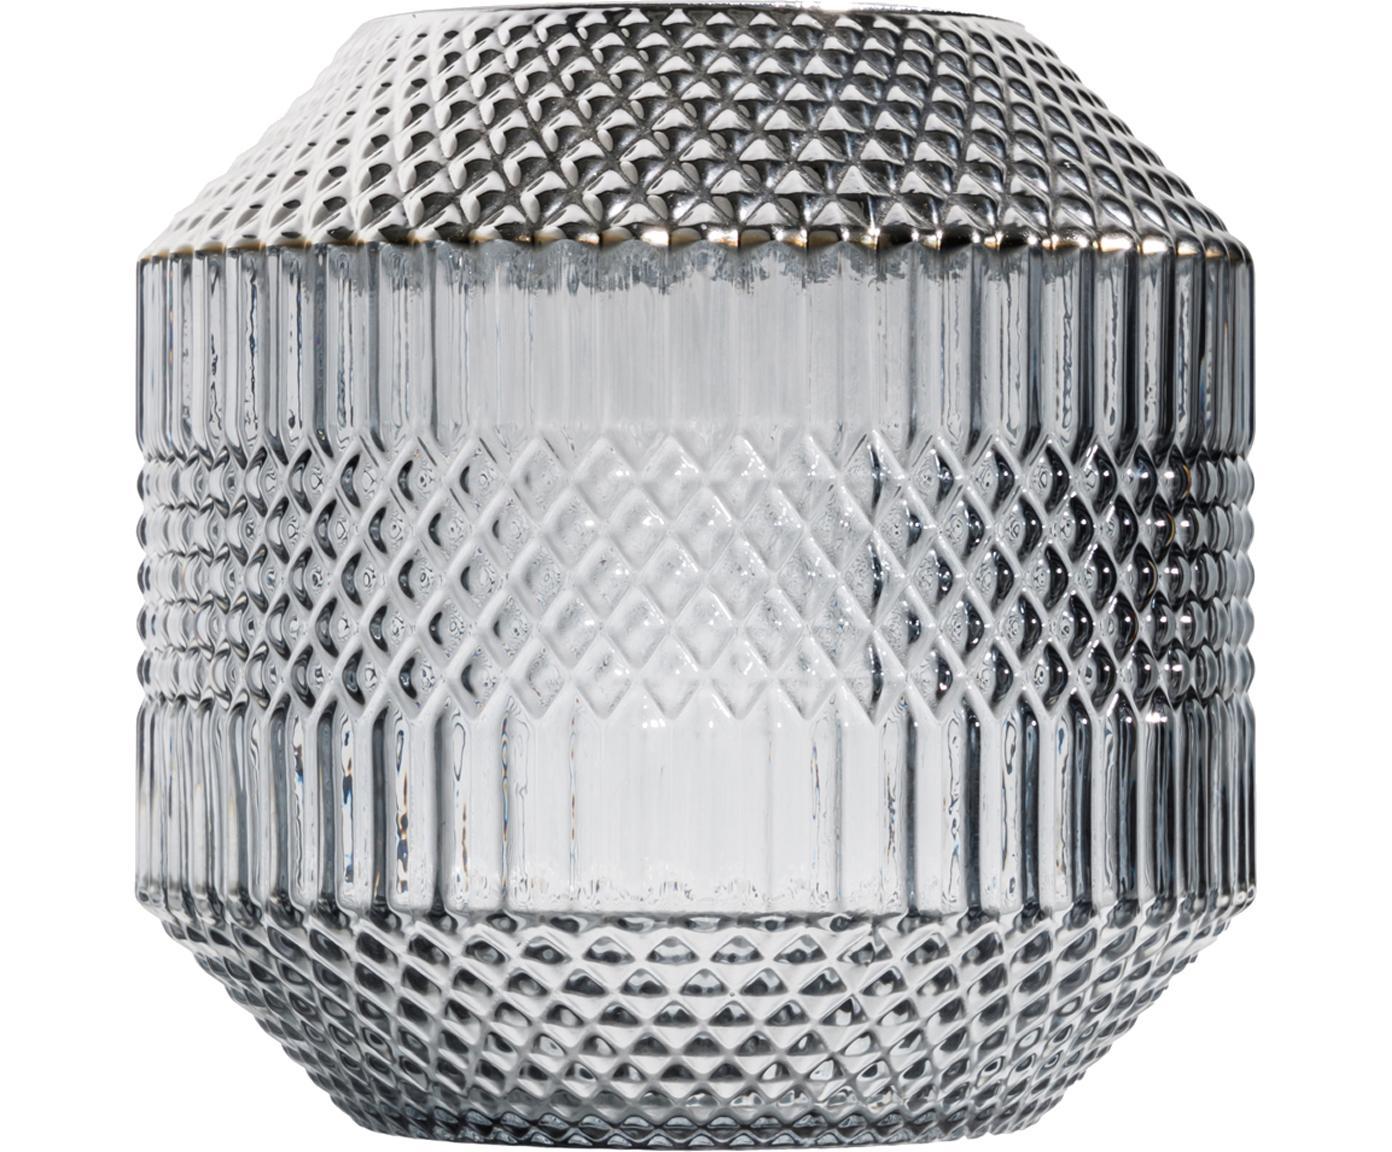 Glazen vaas Dolin, Glas, metaal, Grijs, transparant, zilverkleurig, Ø 20 x H 20 cm